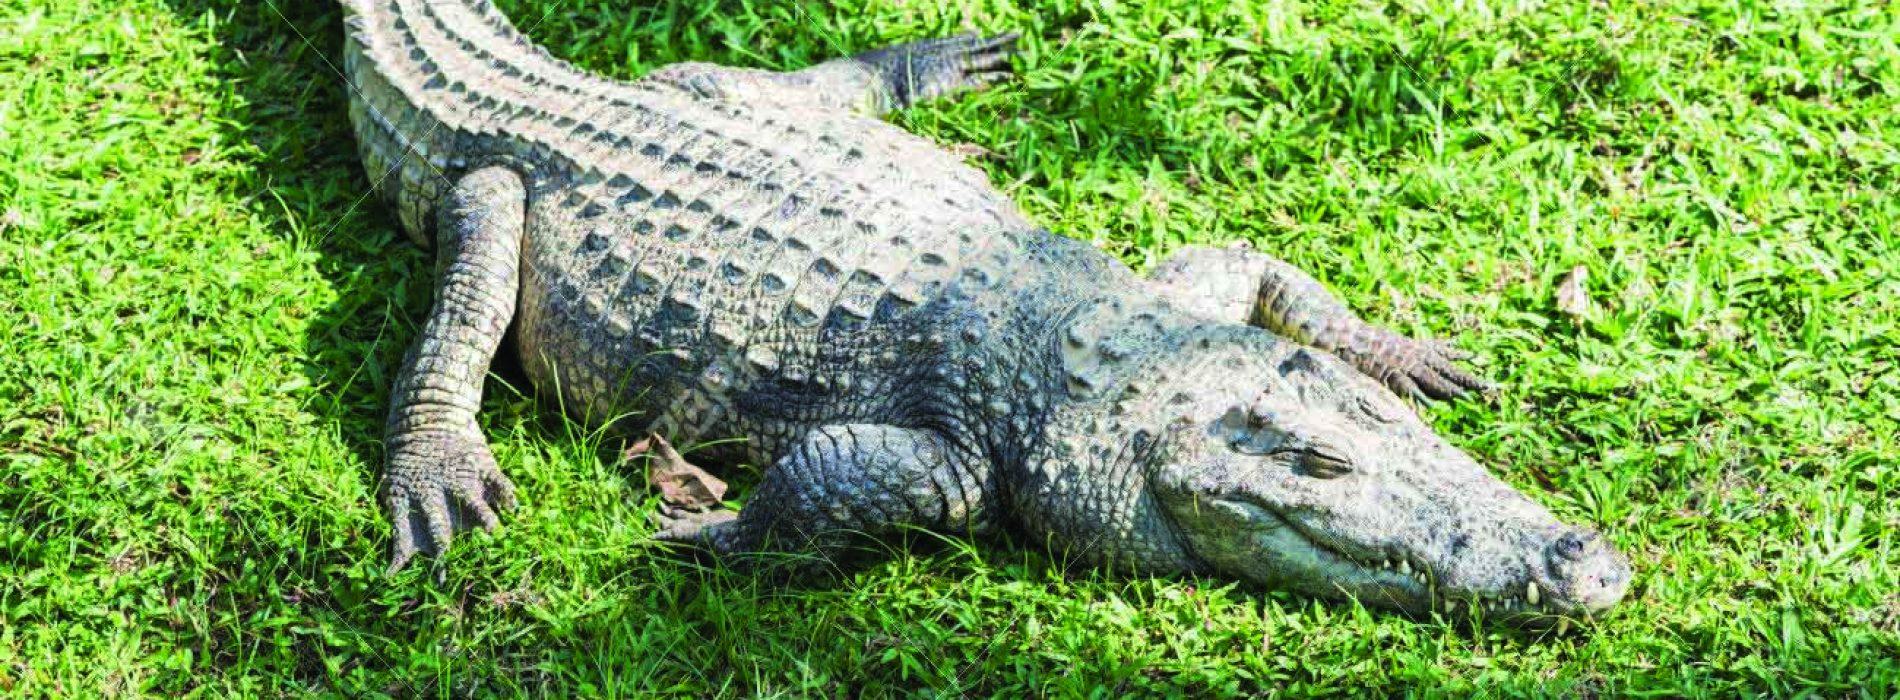 An accountant and a crocodile – a short story